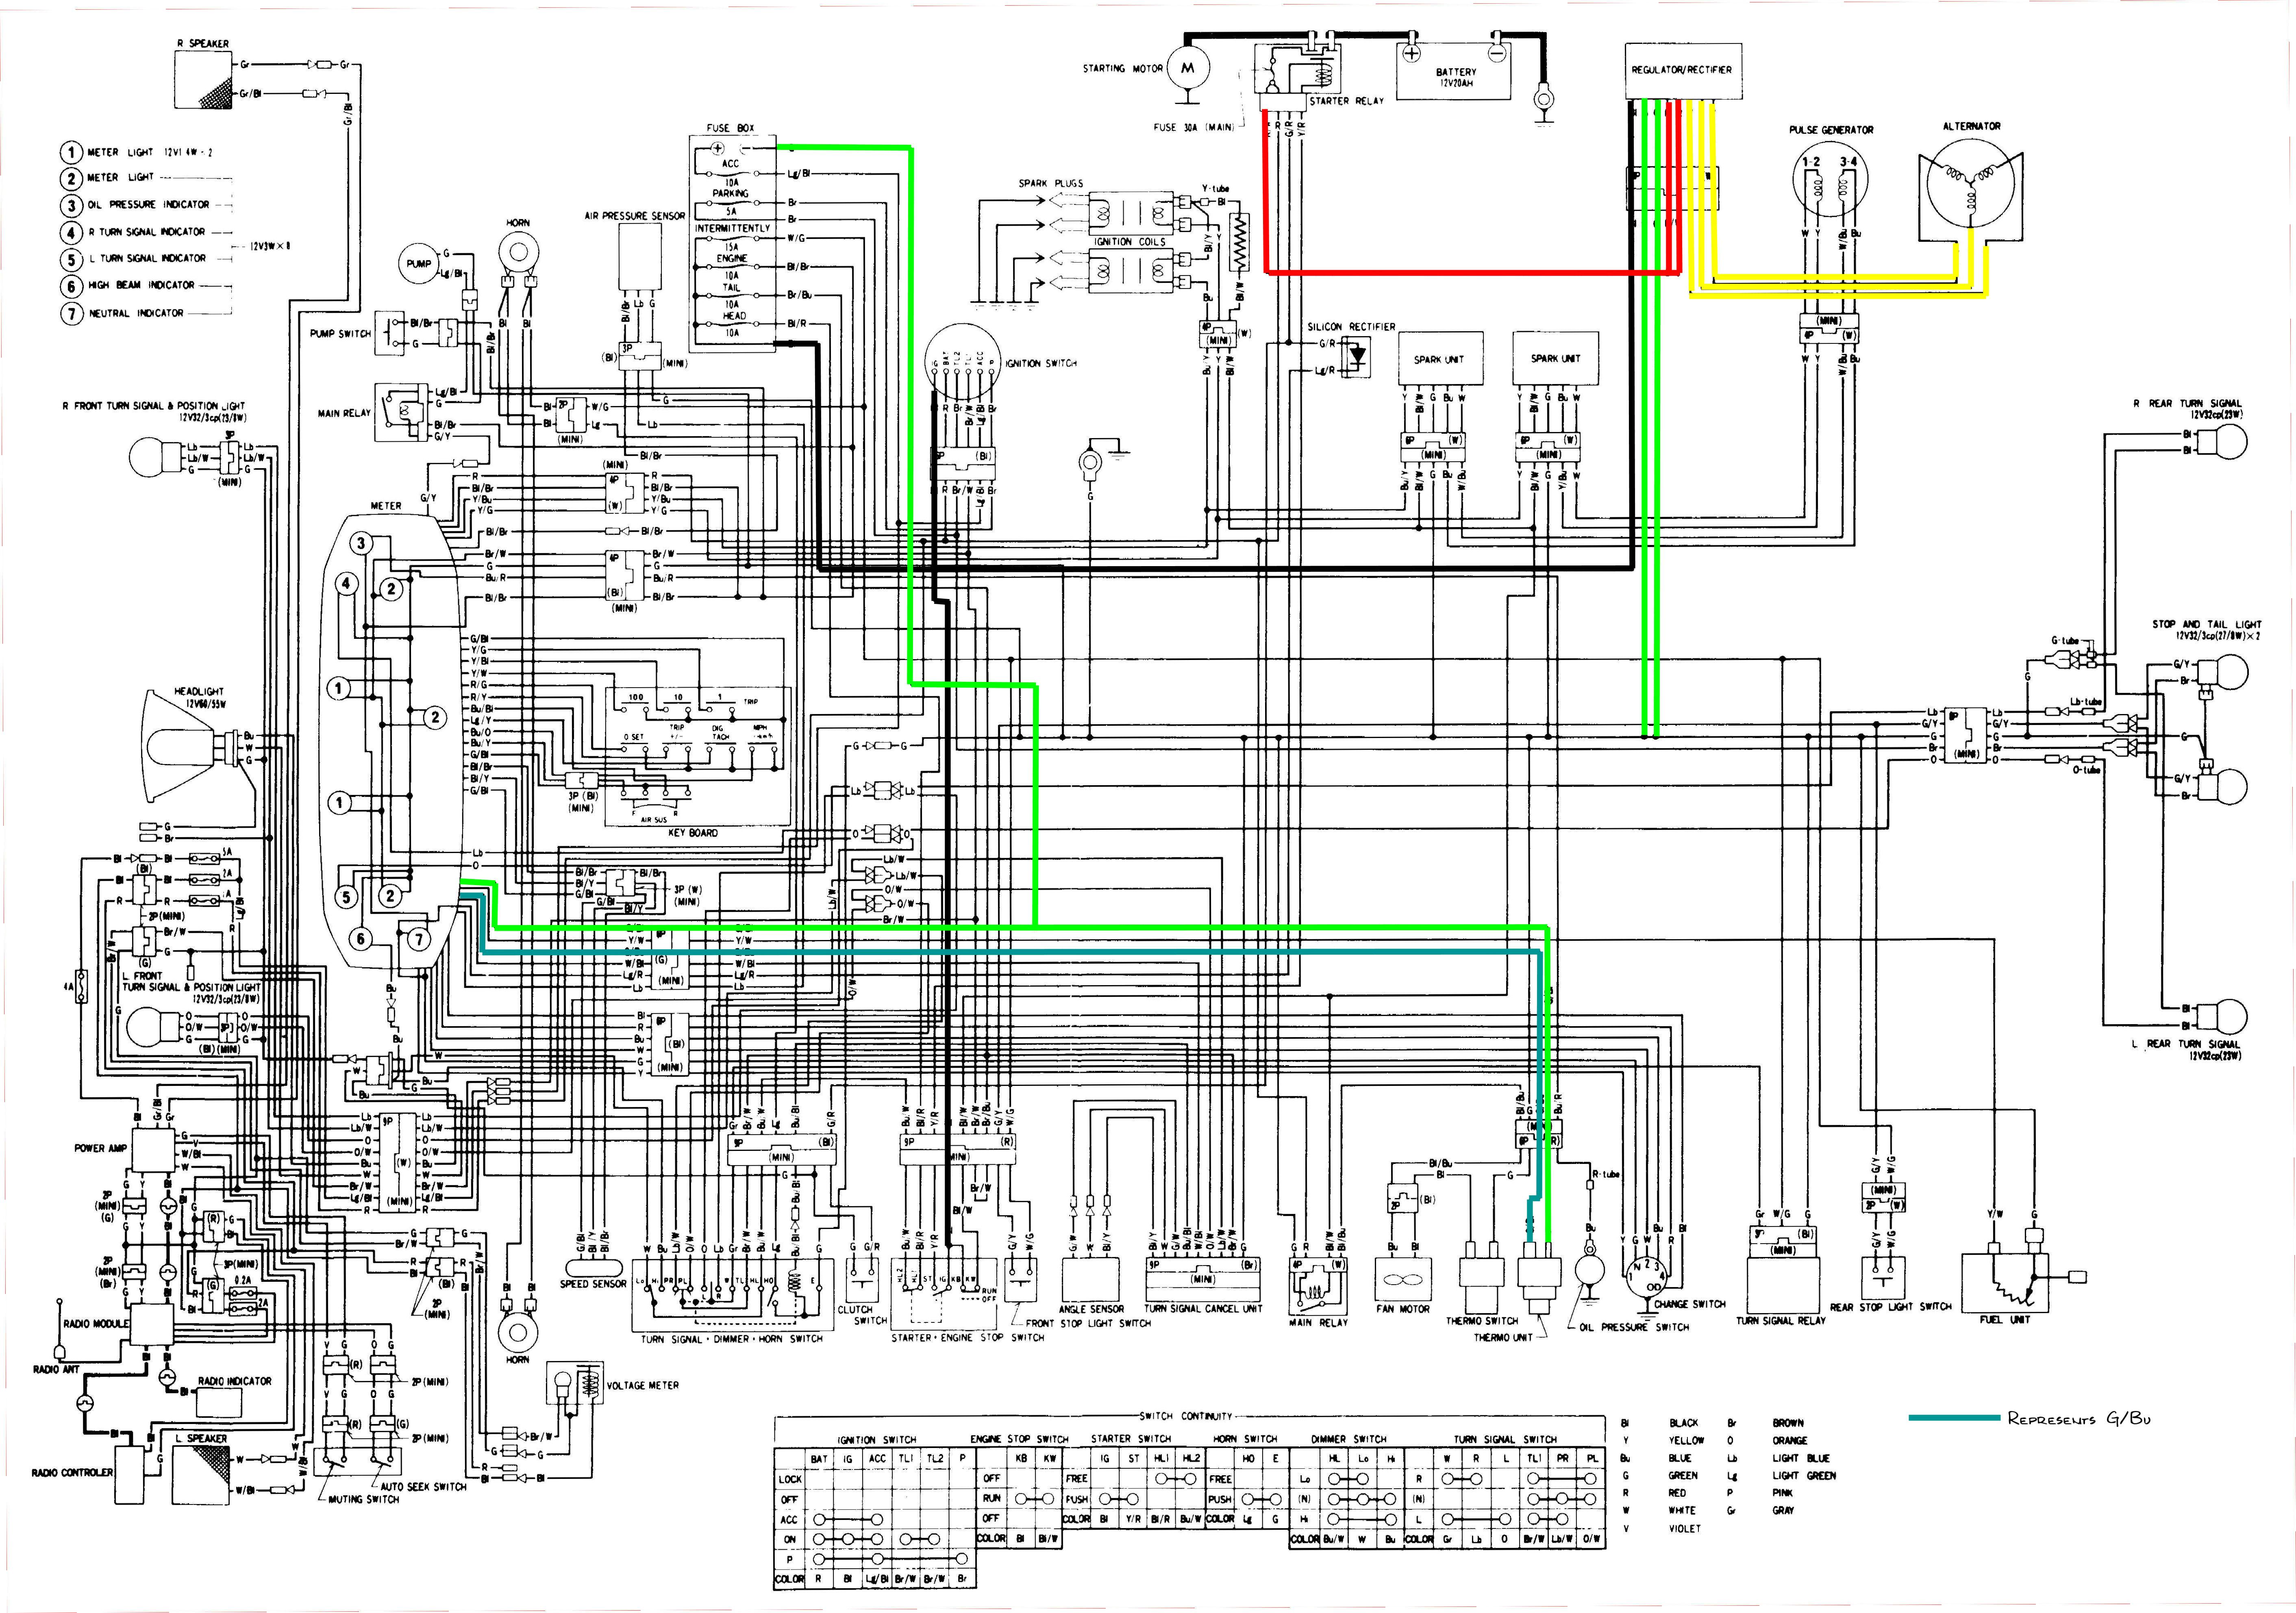 2002 honda goldwing 1800 wiring diagram best wiring diagram image 2018 rh diagram oceanodigital us honda goldwing gl1800 wiring diagram honda goldwing 1800 wiring diagram